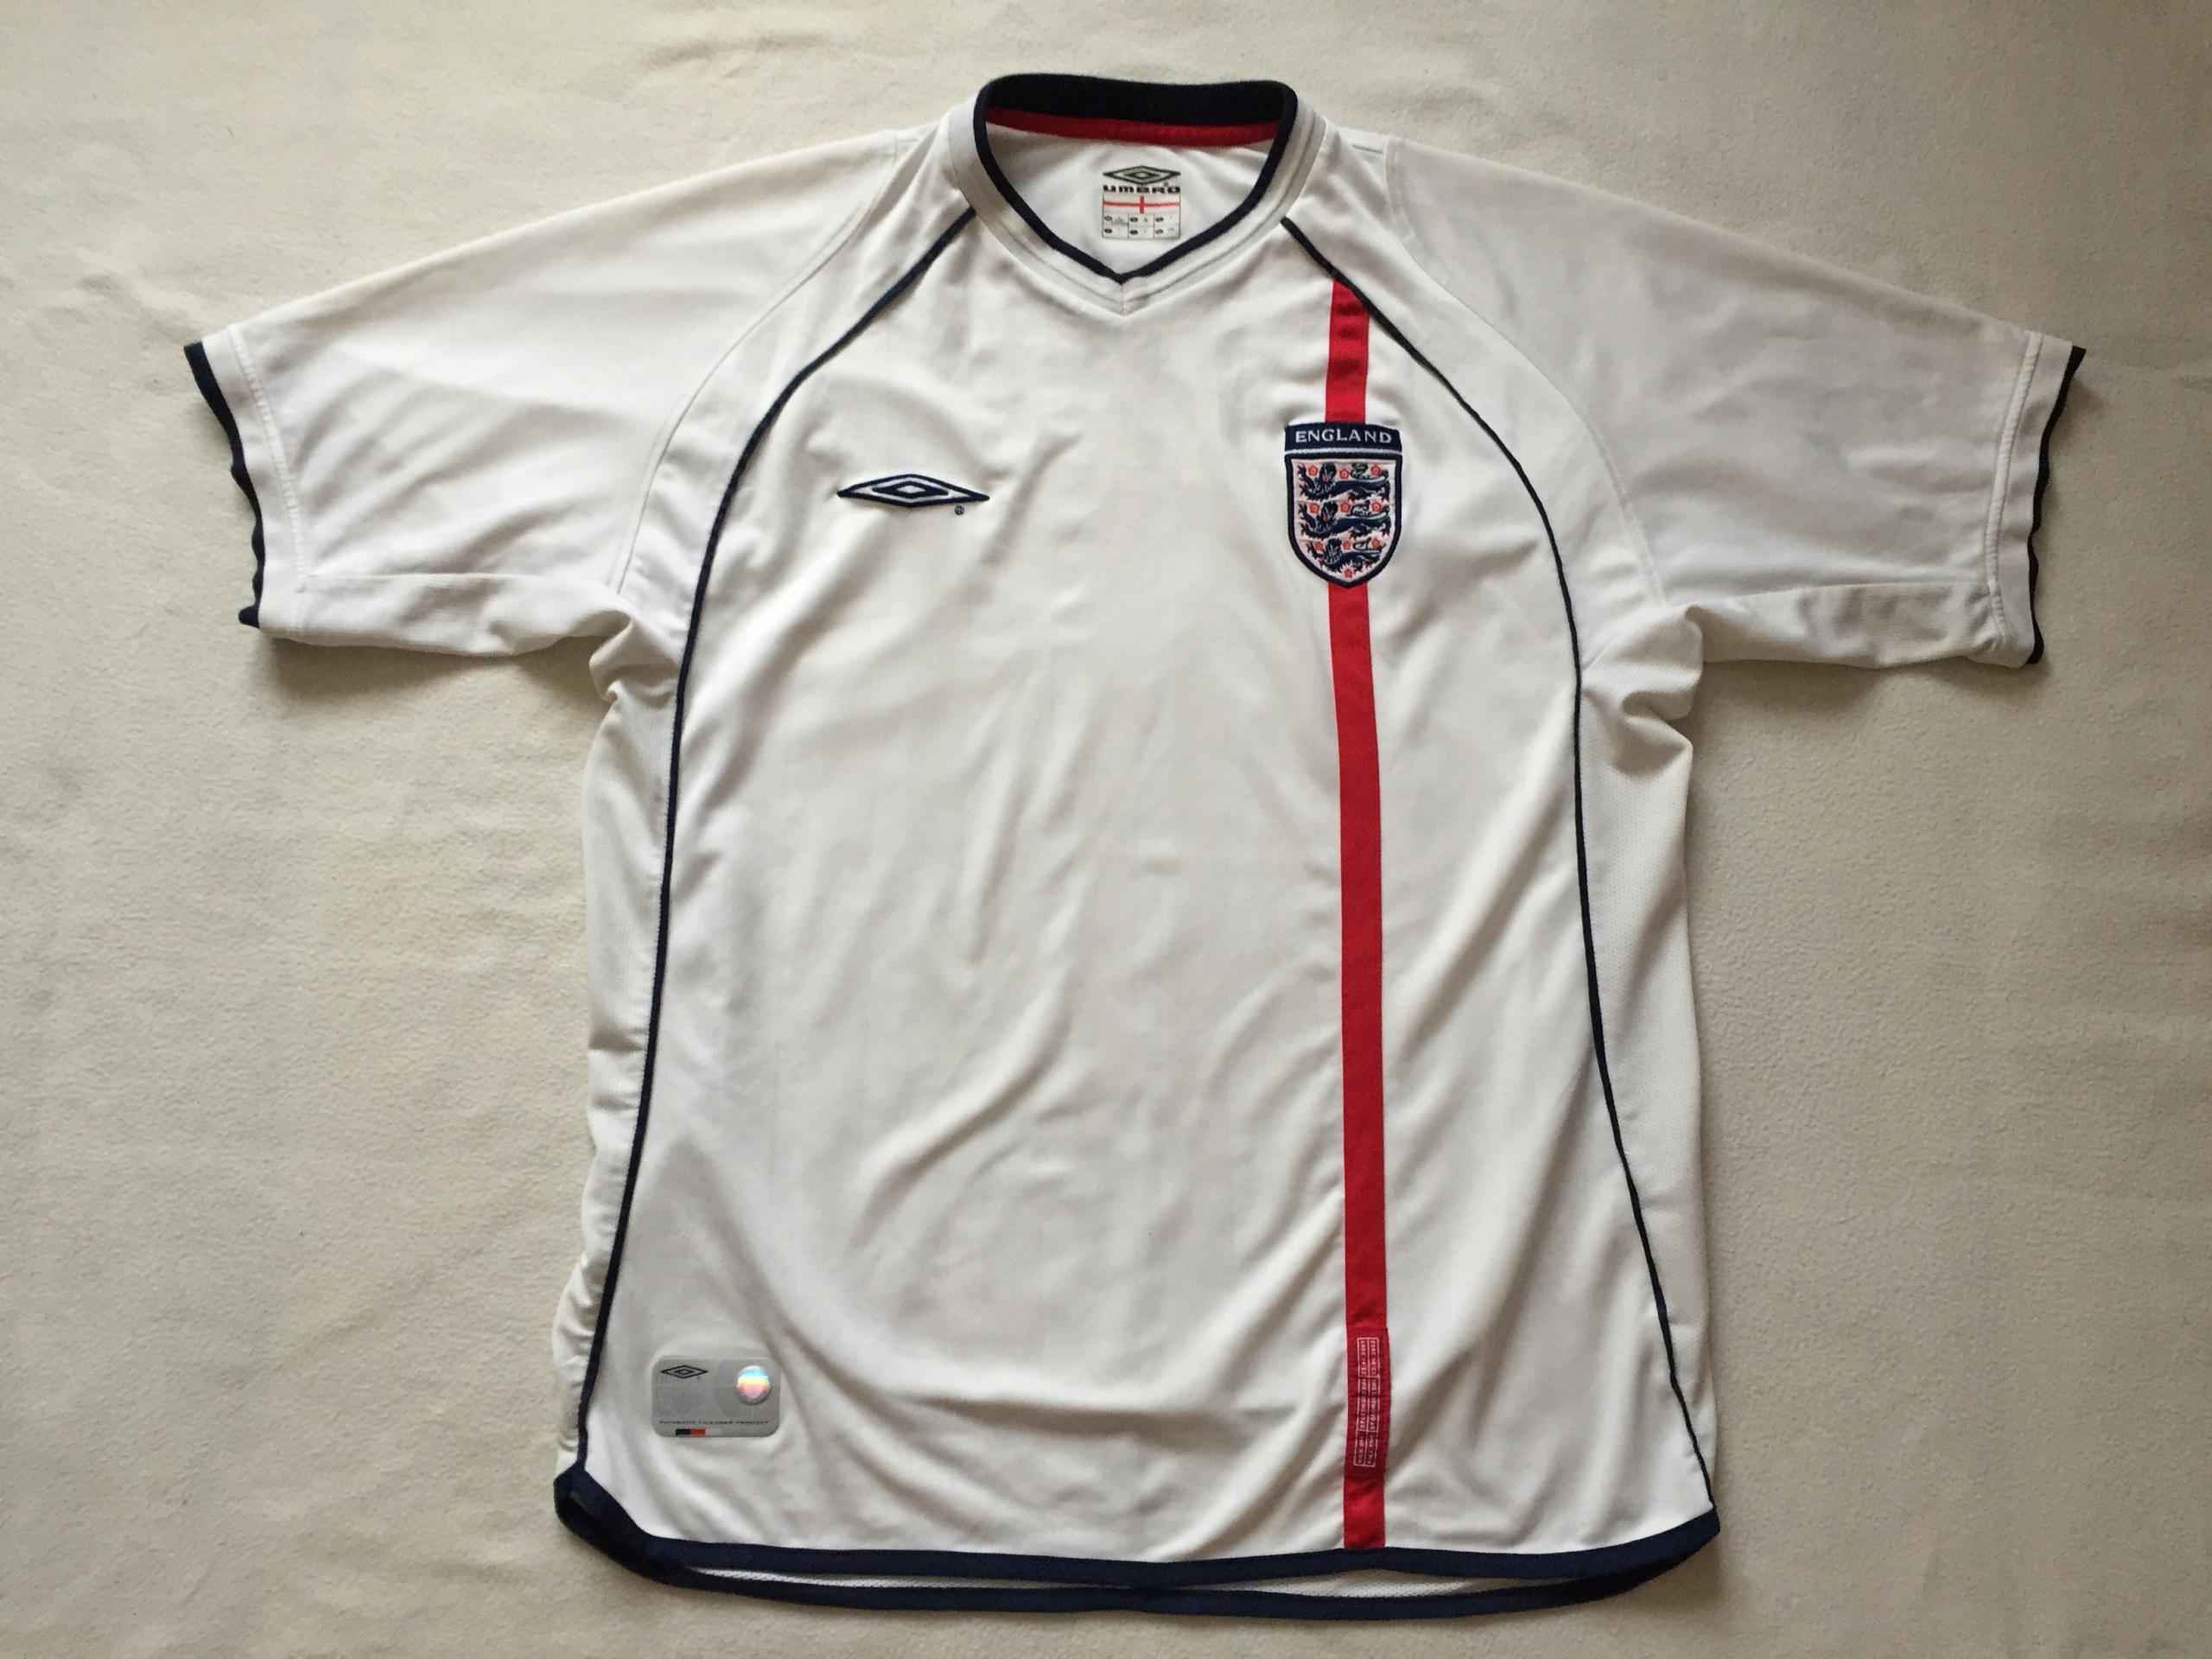 Koszulka reprezentacji Anglii-sezon 2002 r.